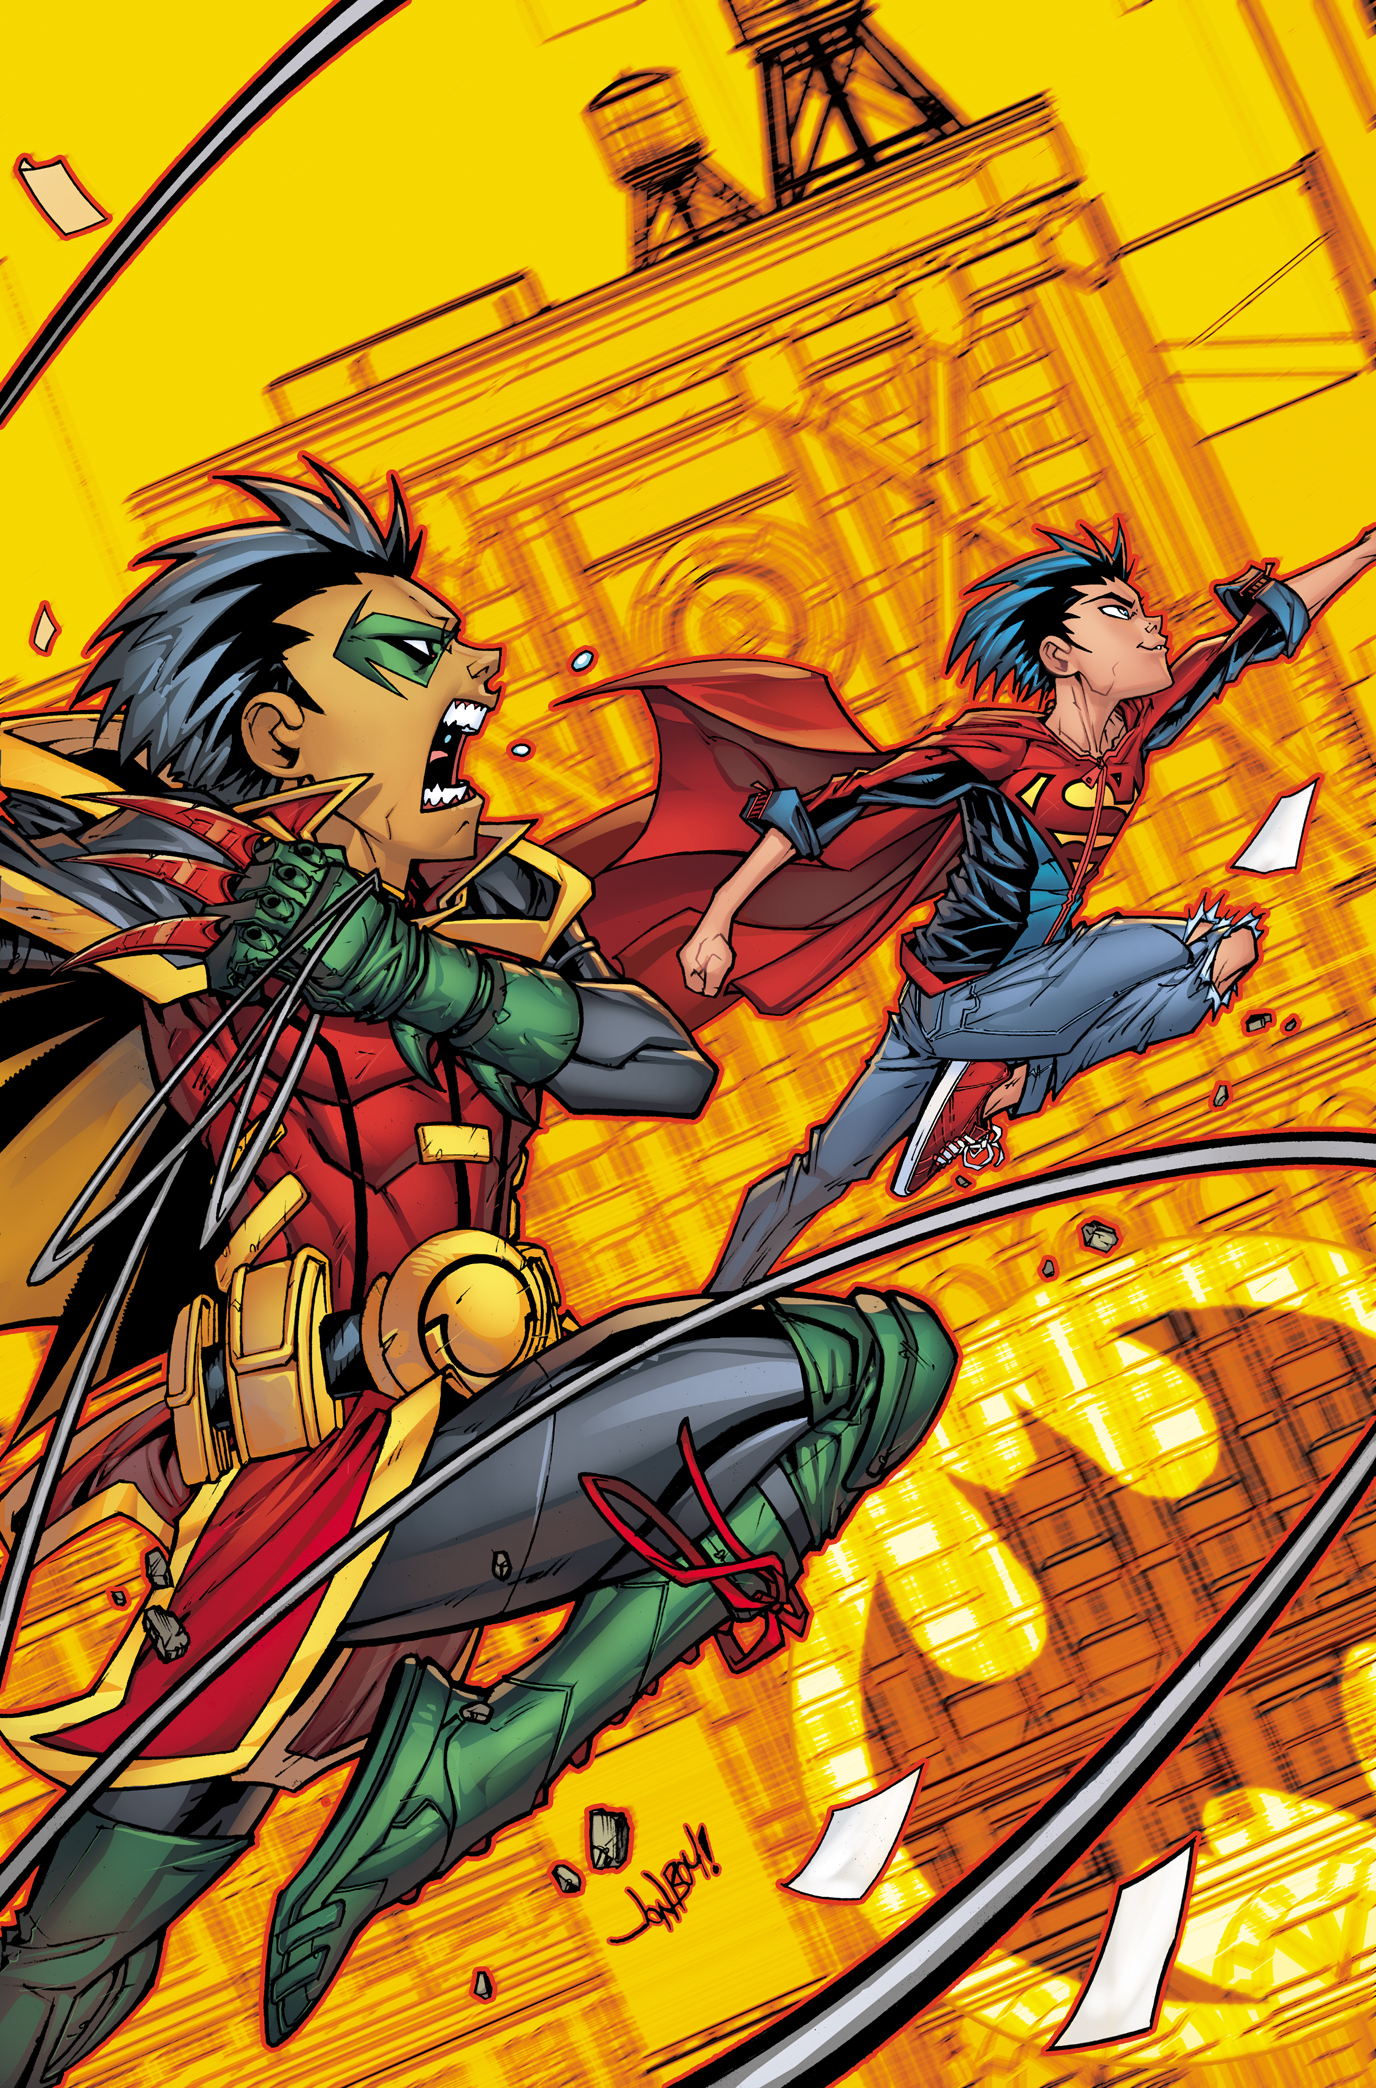 0120-jonboy super sons #1